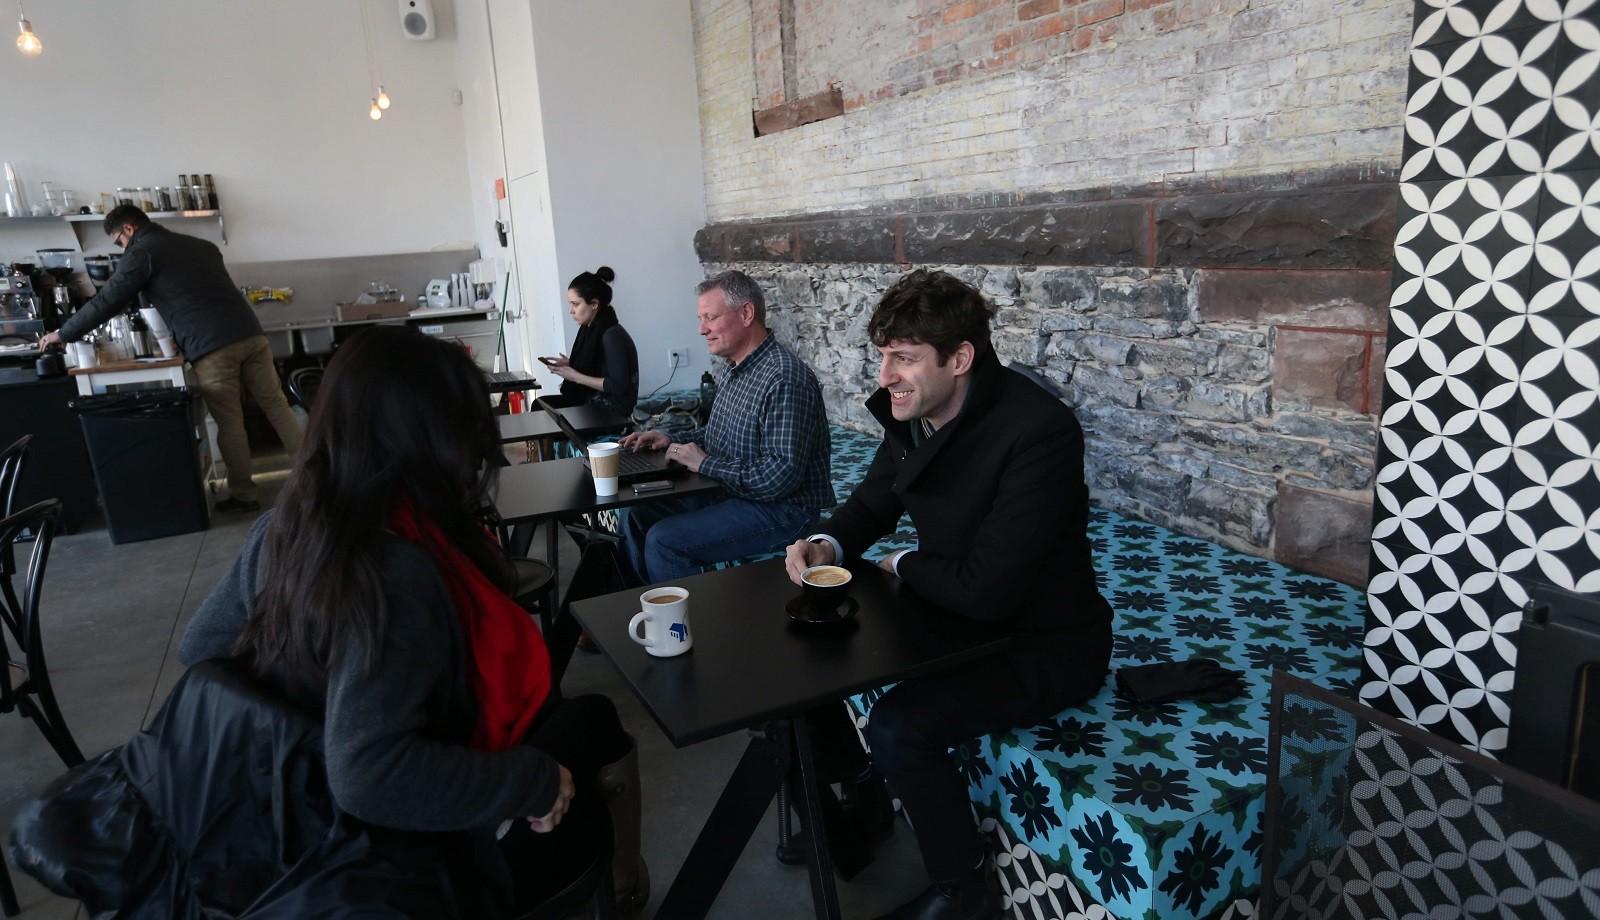 Ana Misenas, left and Adam Sokol enjoy some coffee and conversation at Tipico on Fargo Street. (Sharon Cantillon/Buffalo News)